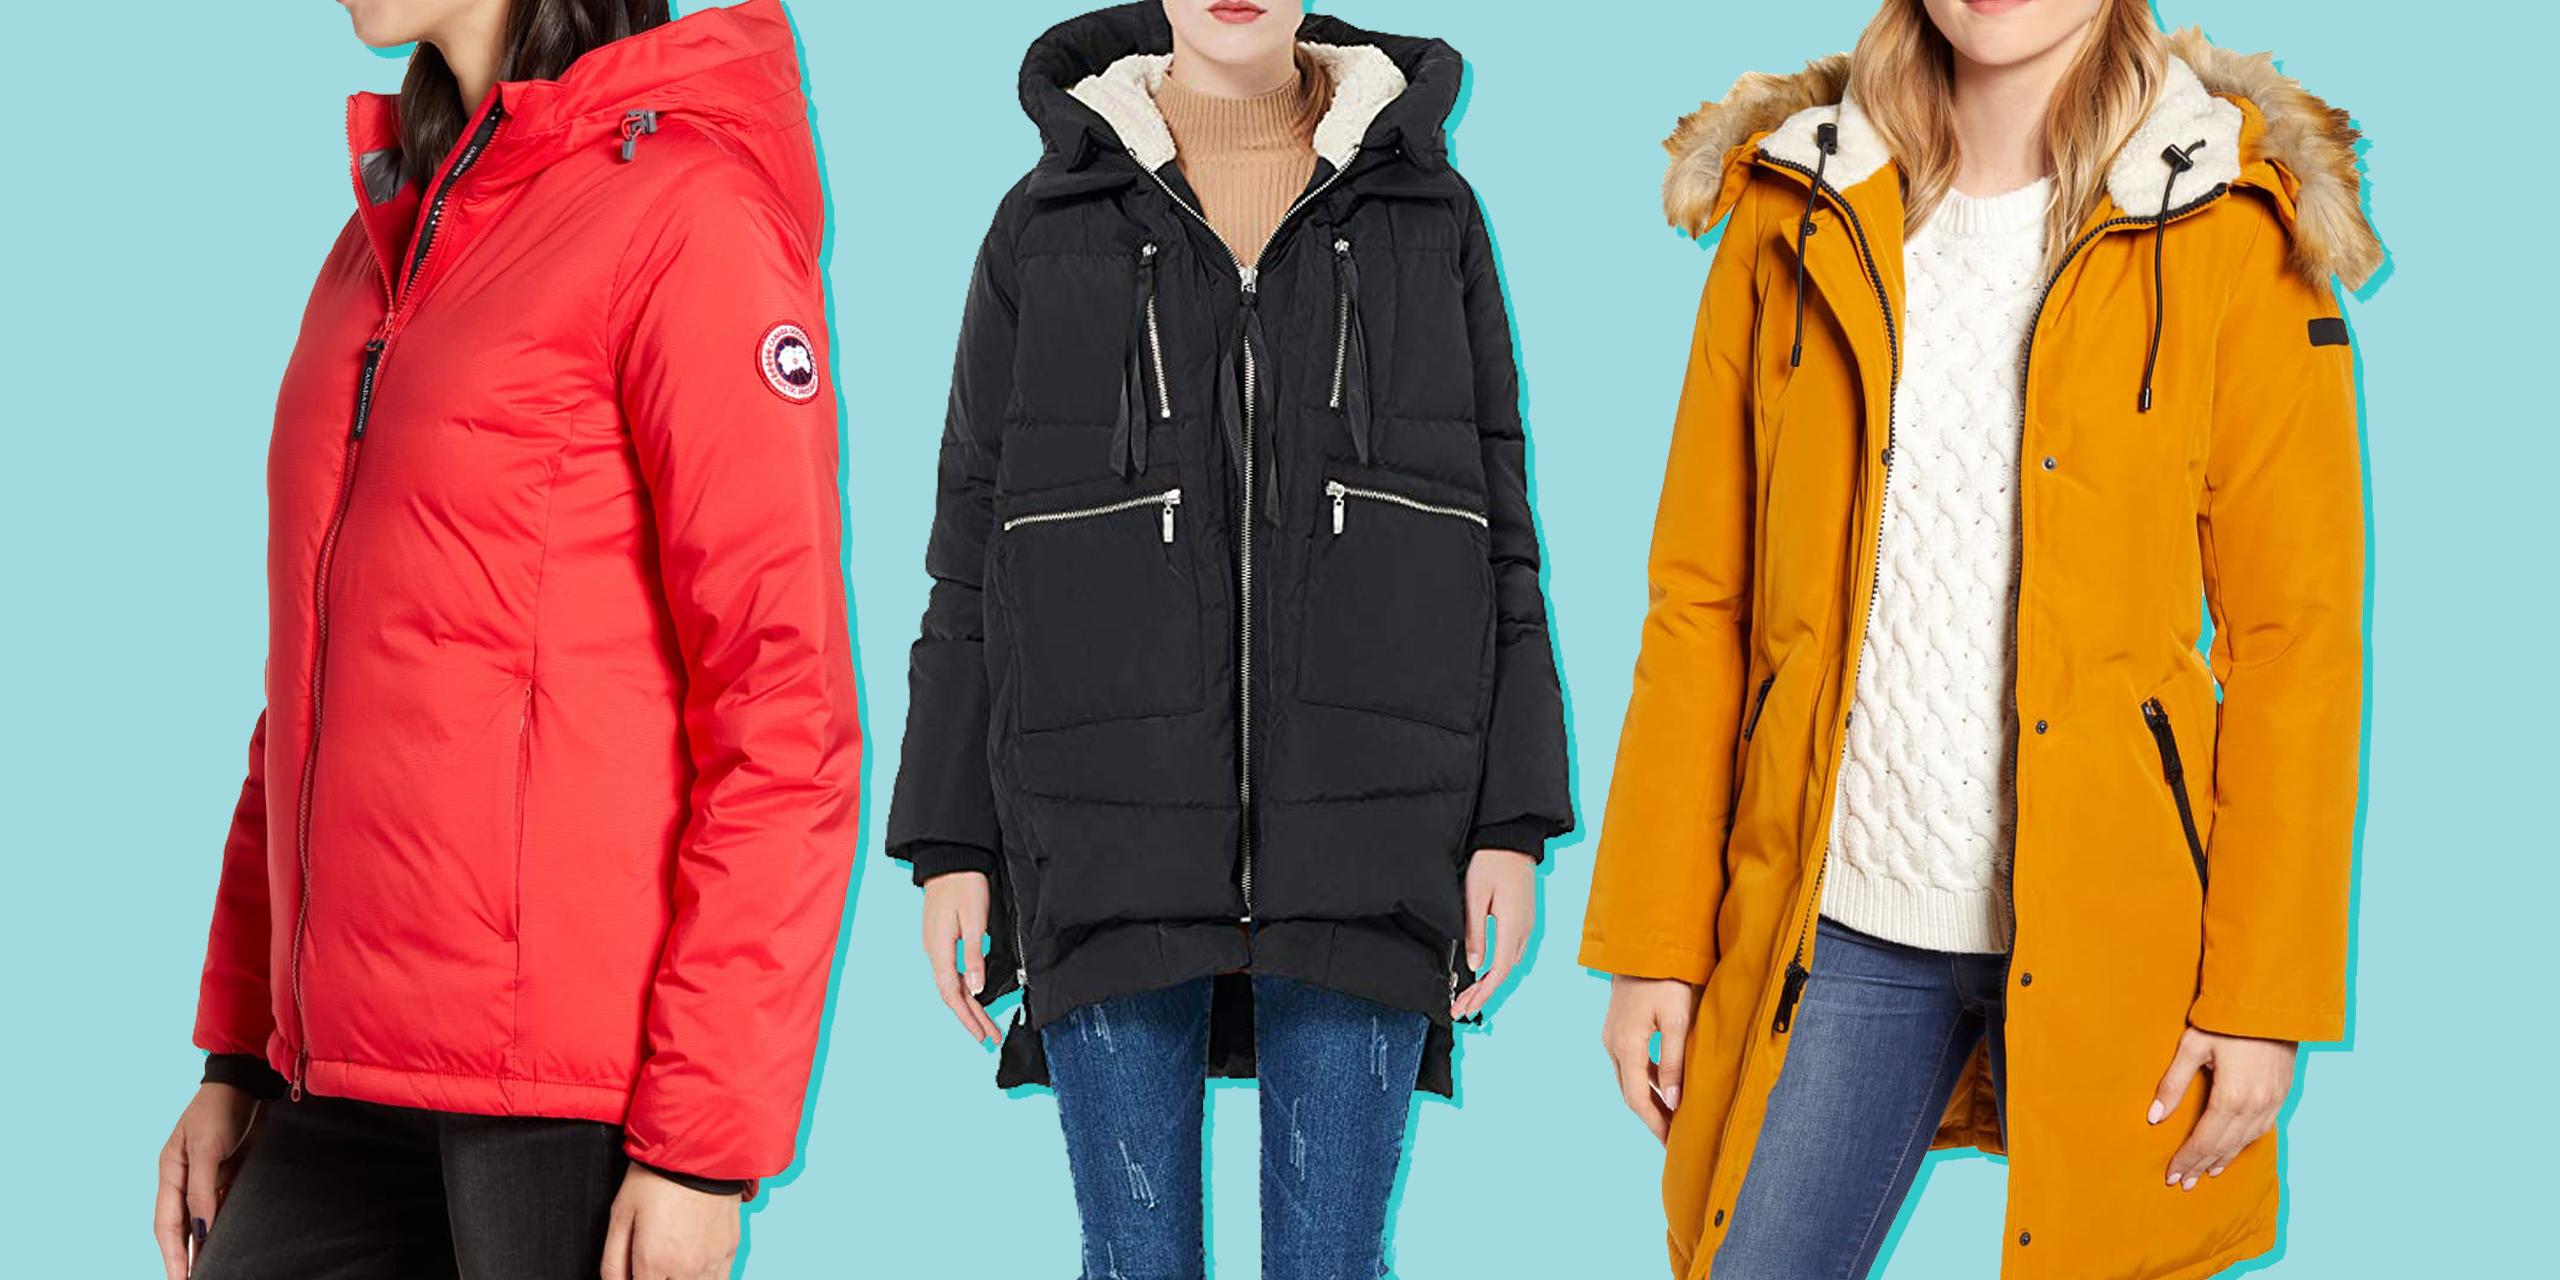 13 Best Potential parkas images | Parka, Winter jackets, Jackets